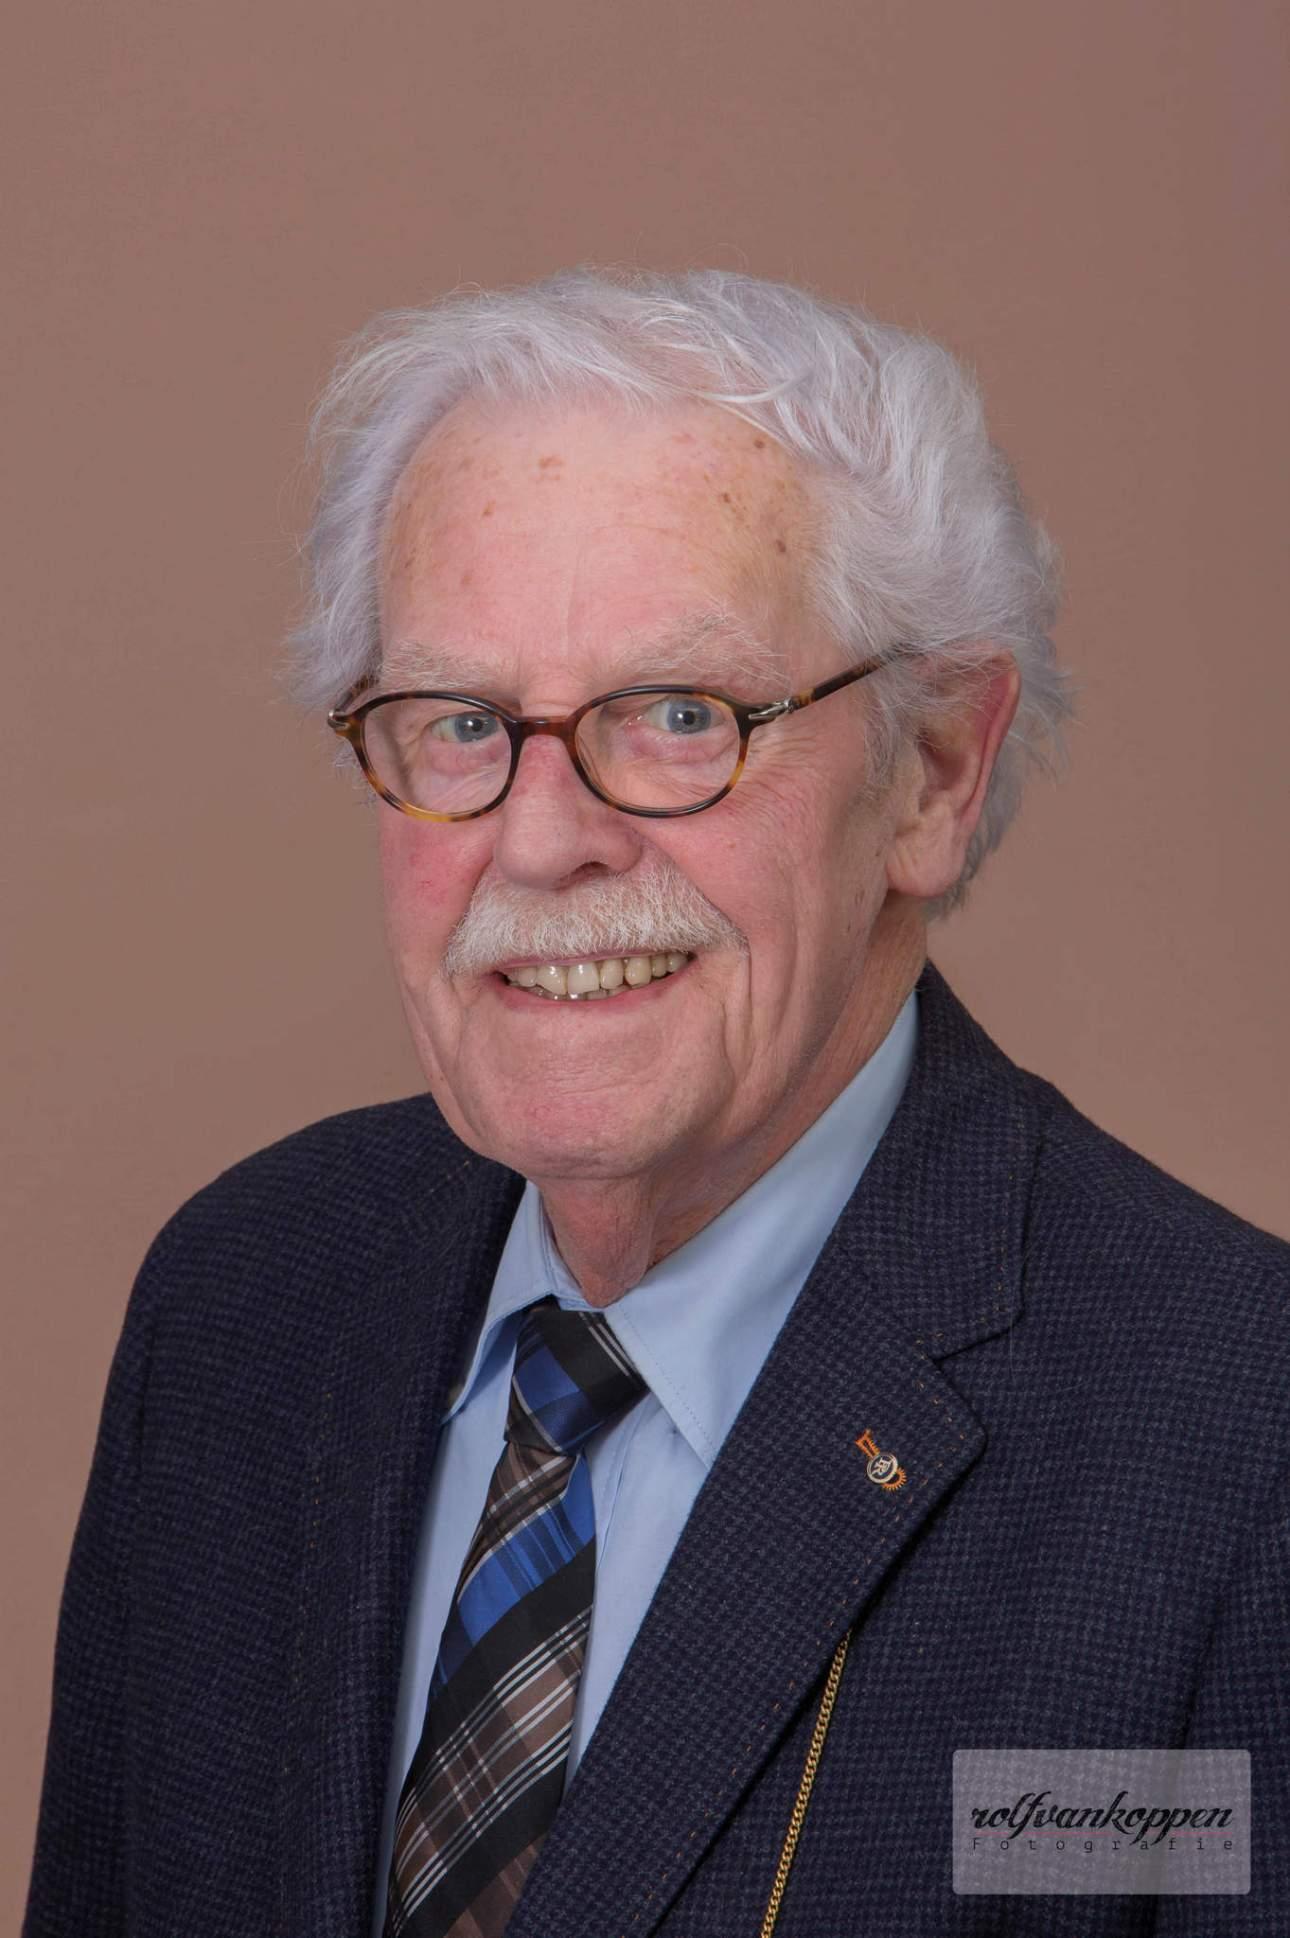 Max Vollebregt